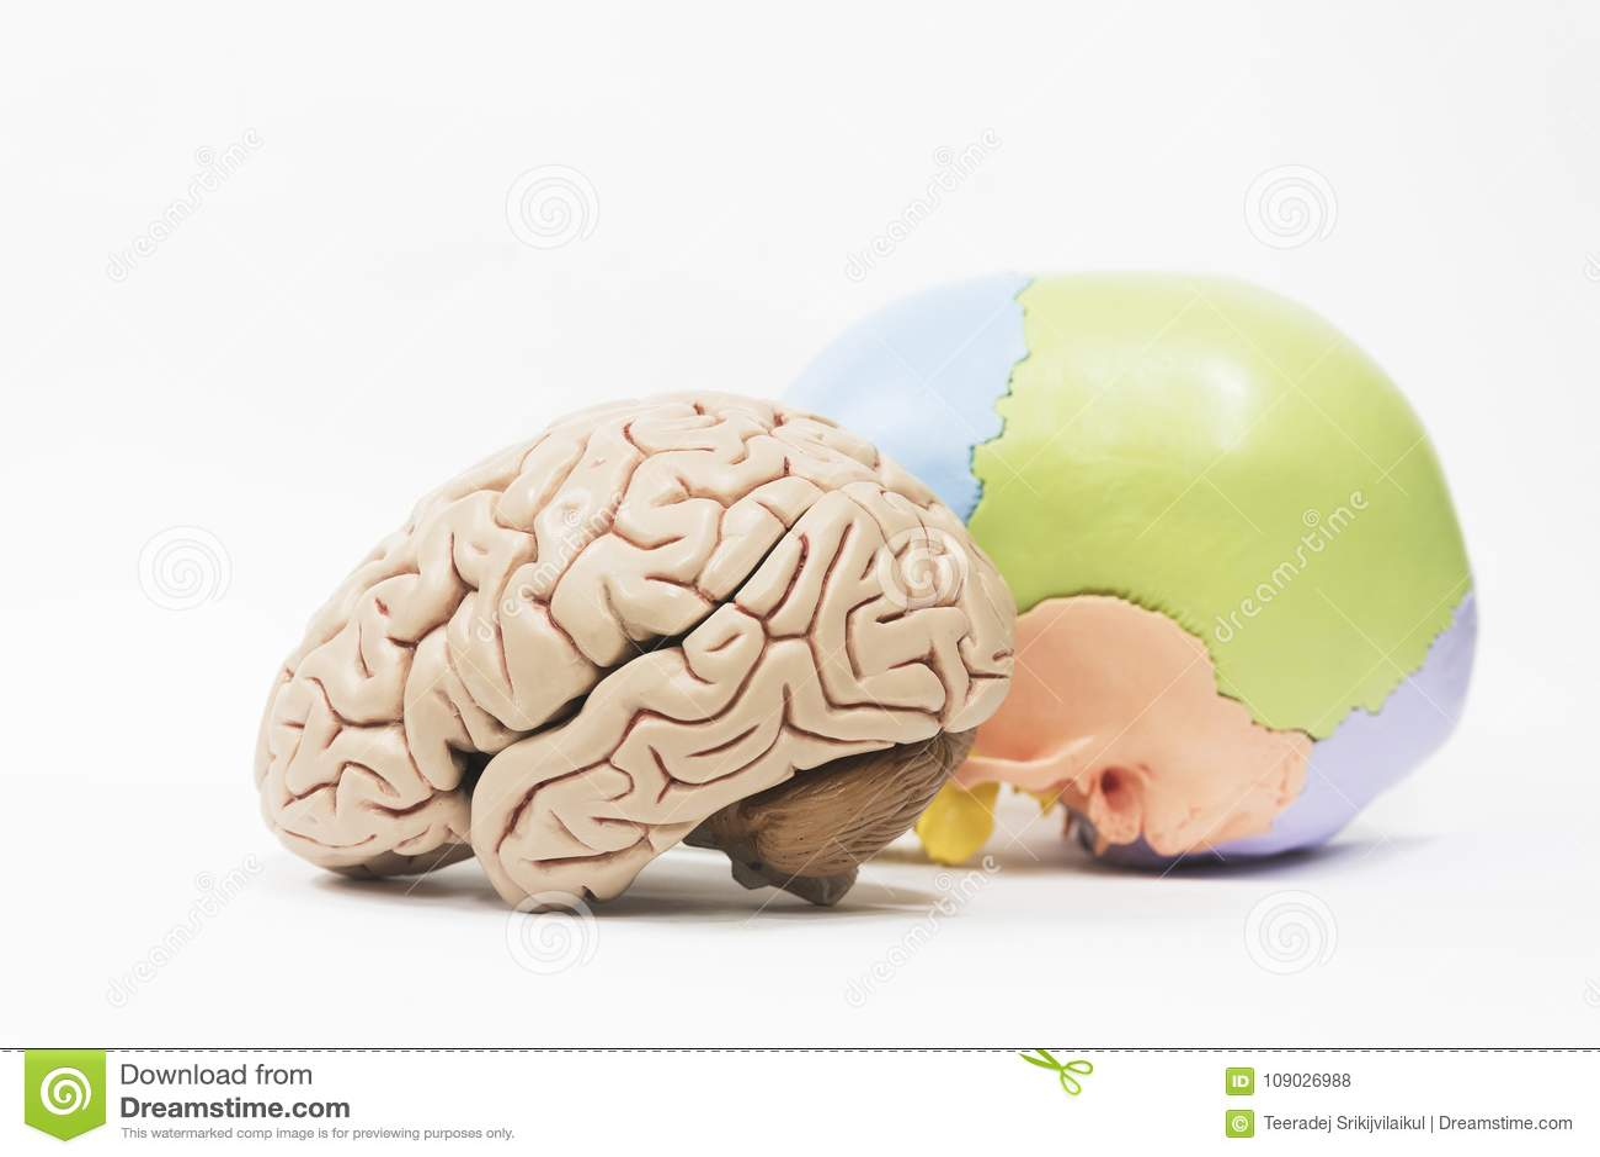 Human Brain And Skull Model On White Background Stock Photo - Image ...